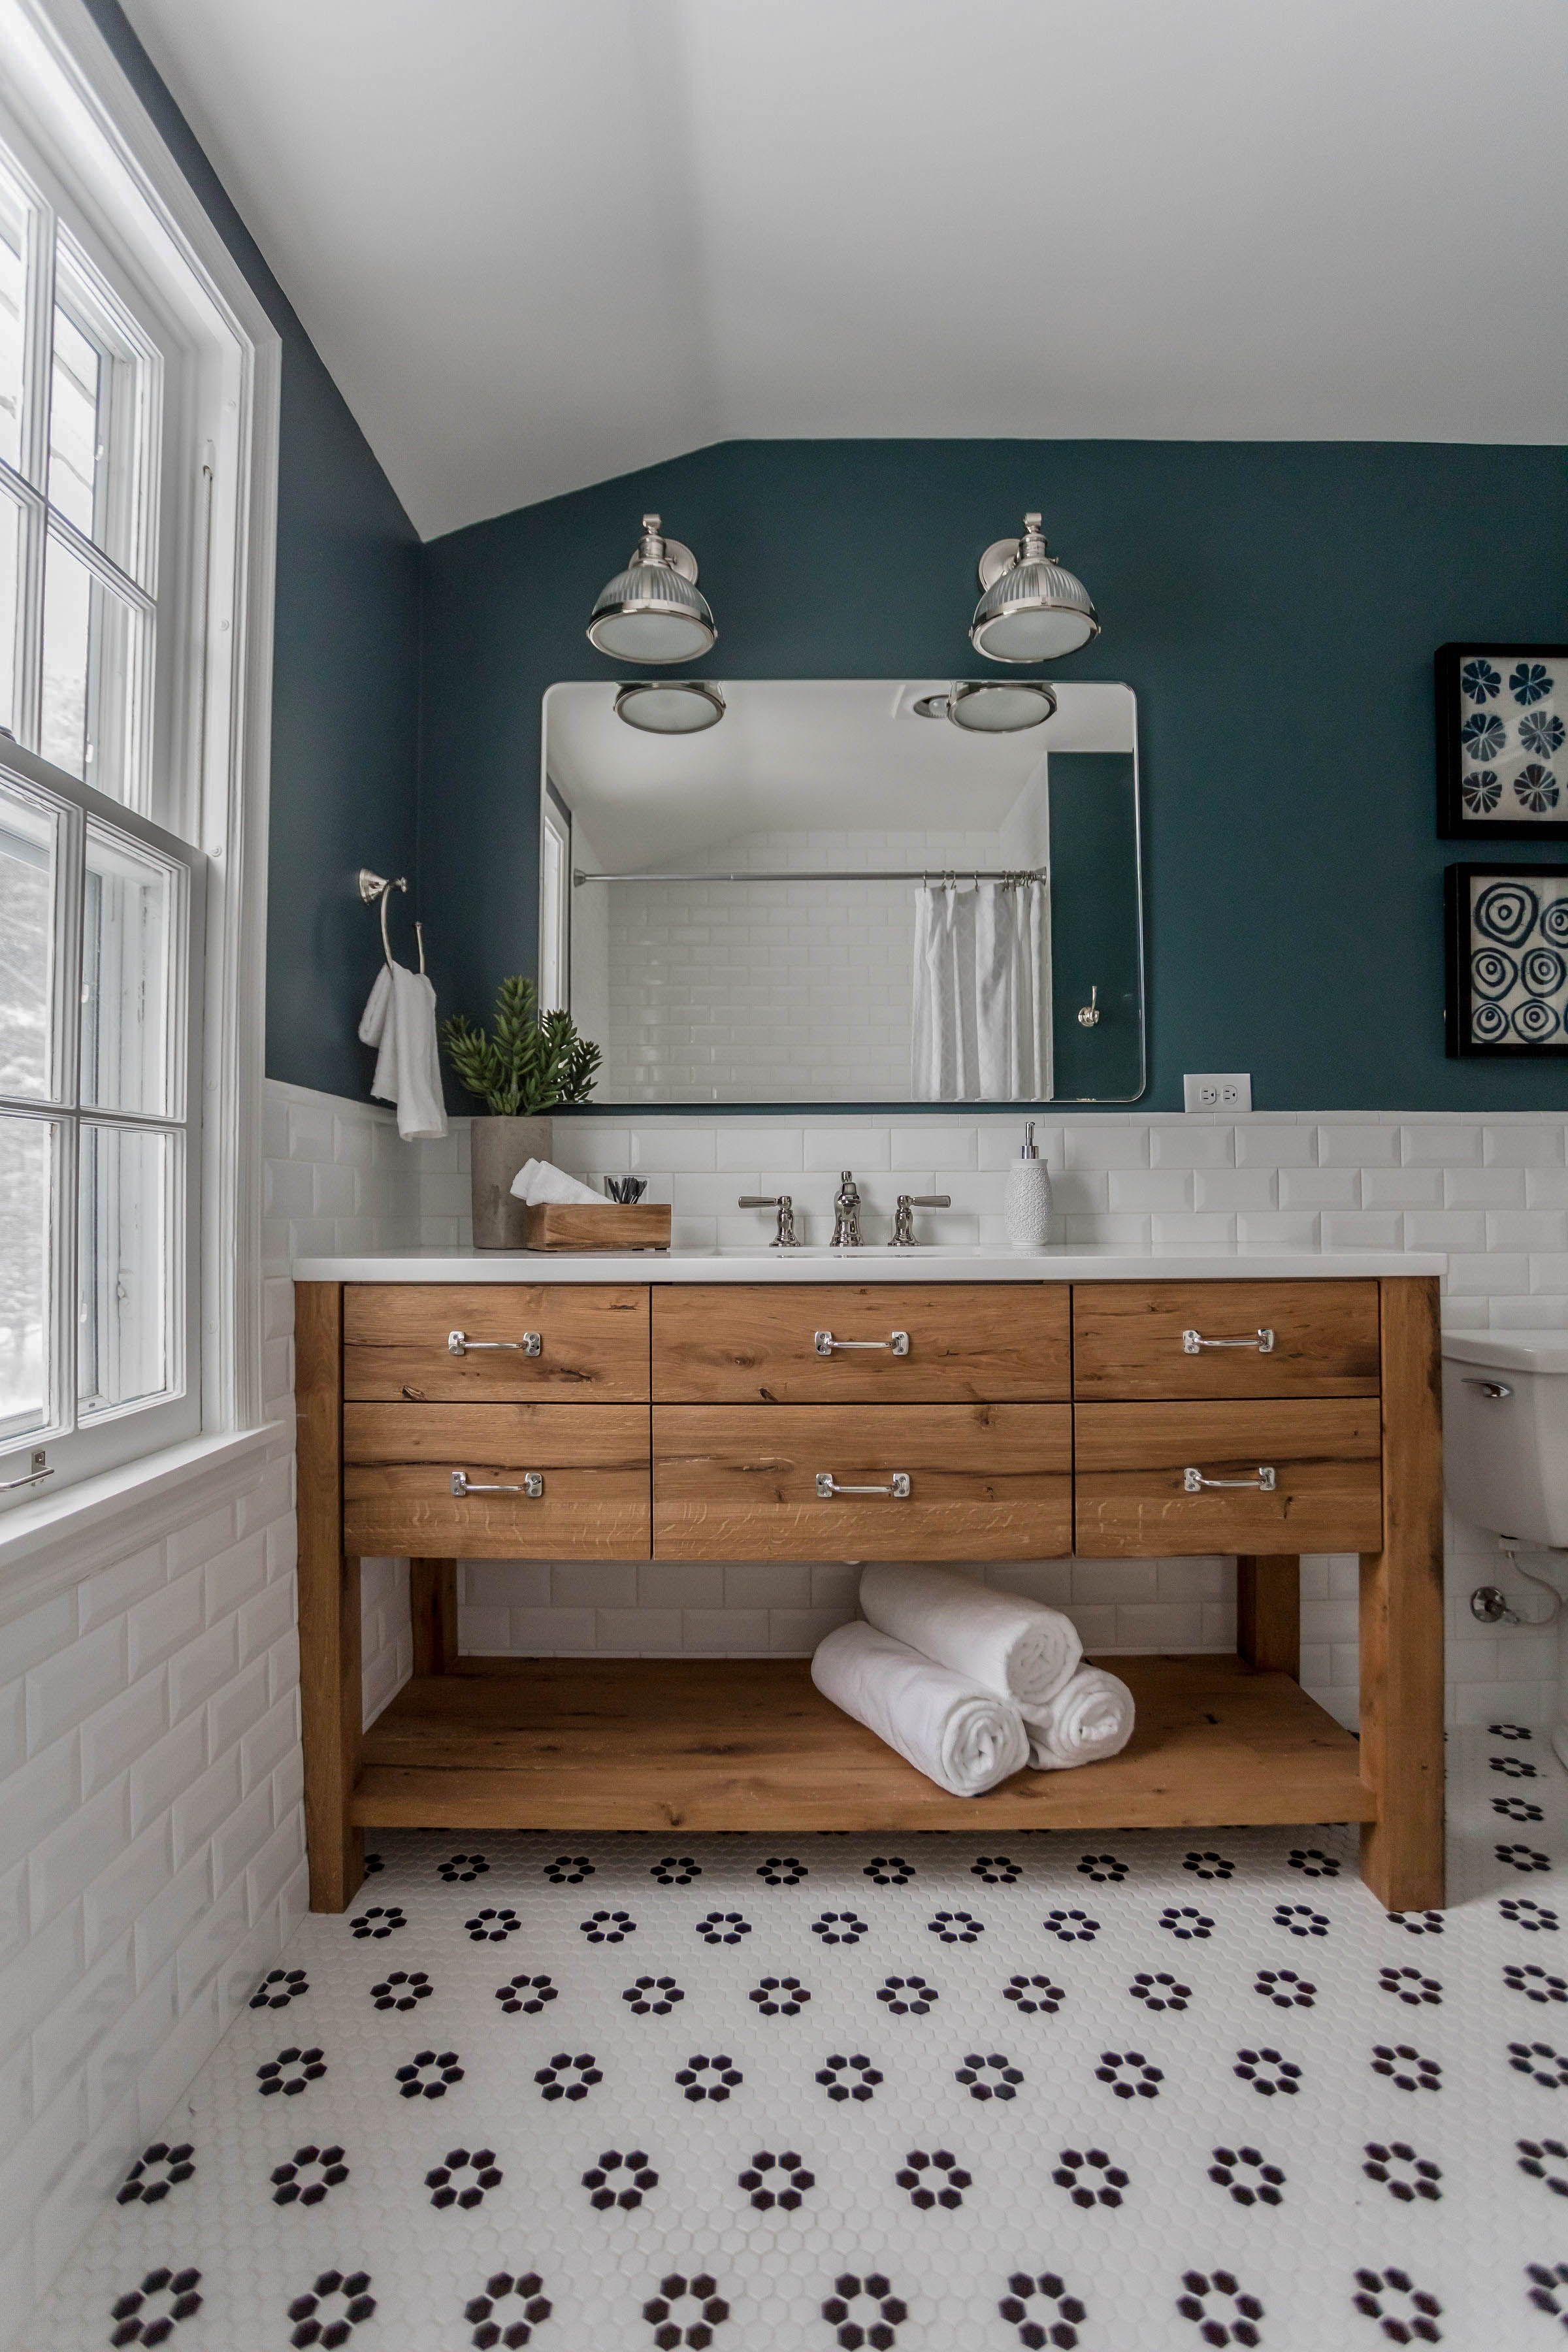 Reclaimed Wood Vanity Black And White Tile Subway Tile Dark